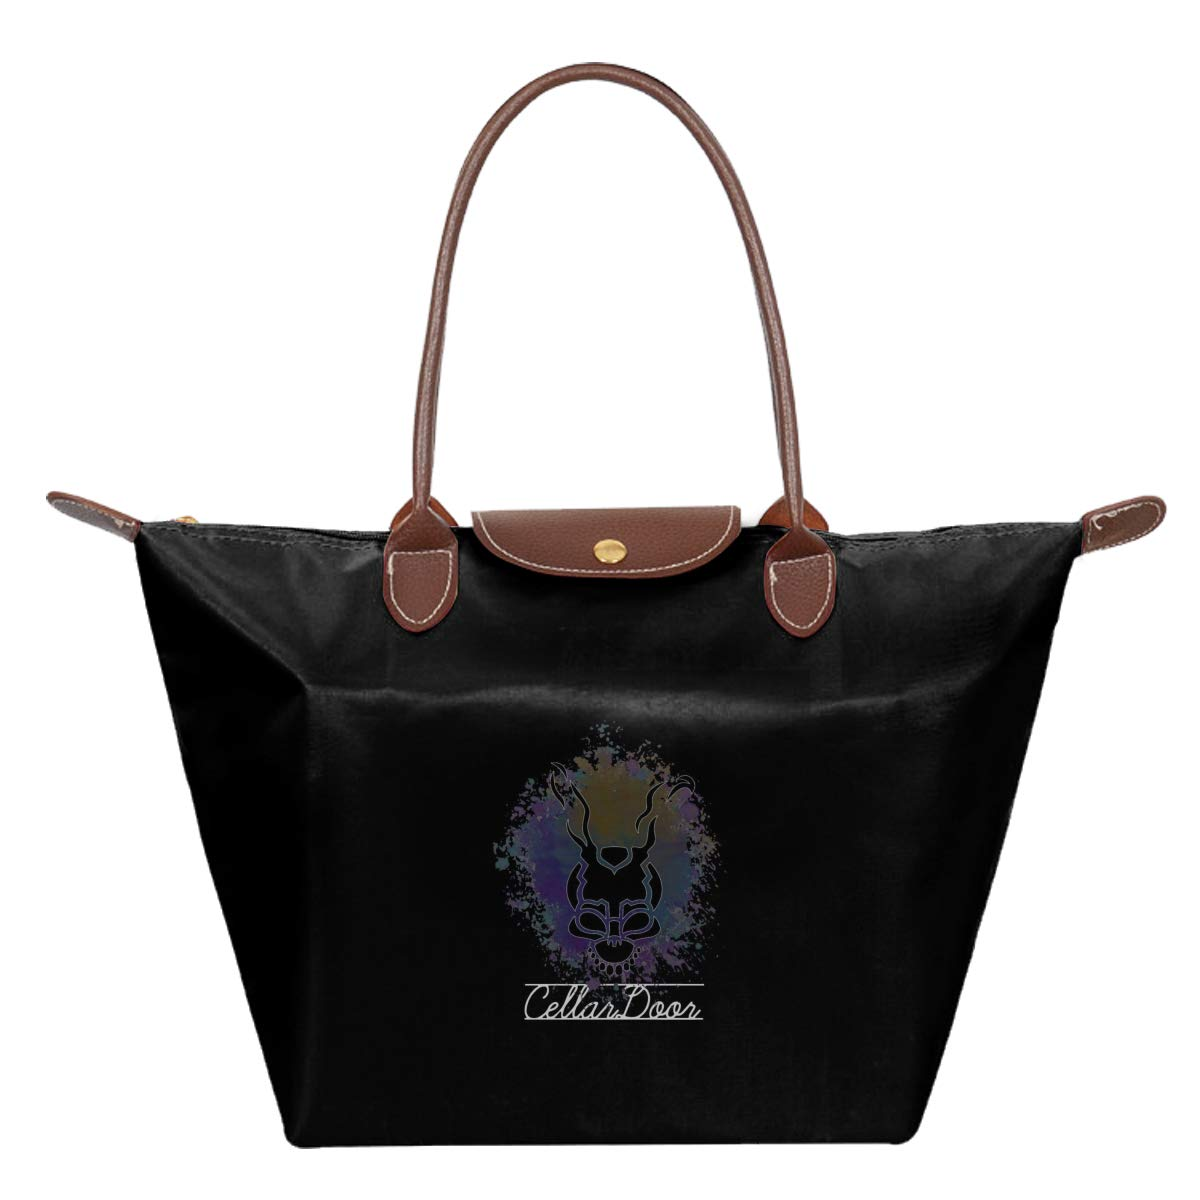 Donnie Darko Frank Cellar Door Montage Waterproof Leather Folded Messenger Nylon Bag Travel Tote Hopping Folding School Handbags